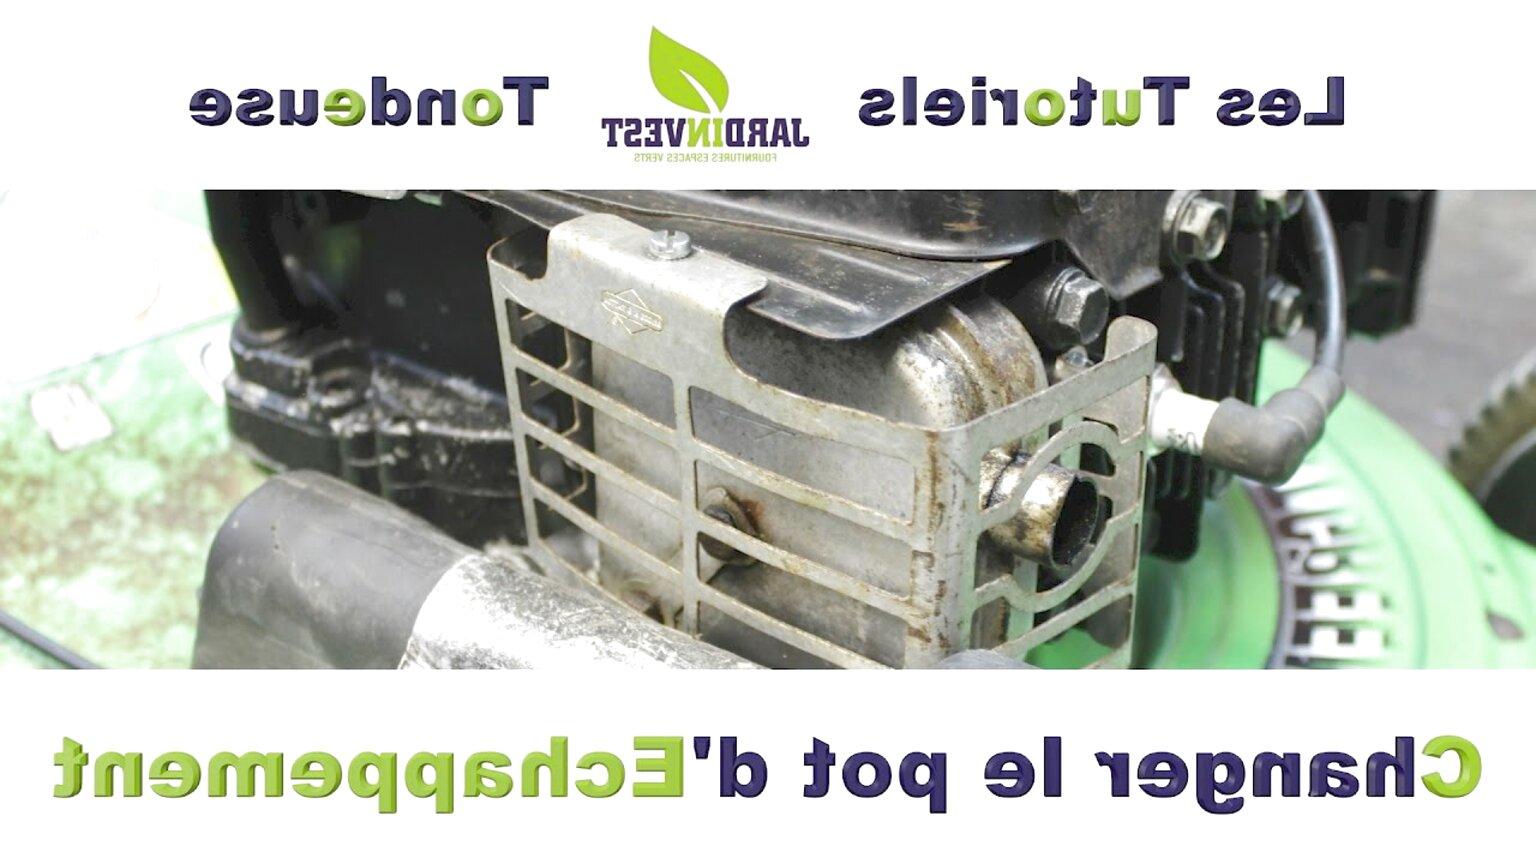 moteur tondeuse briggs stratton d'occasion